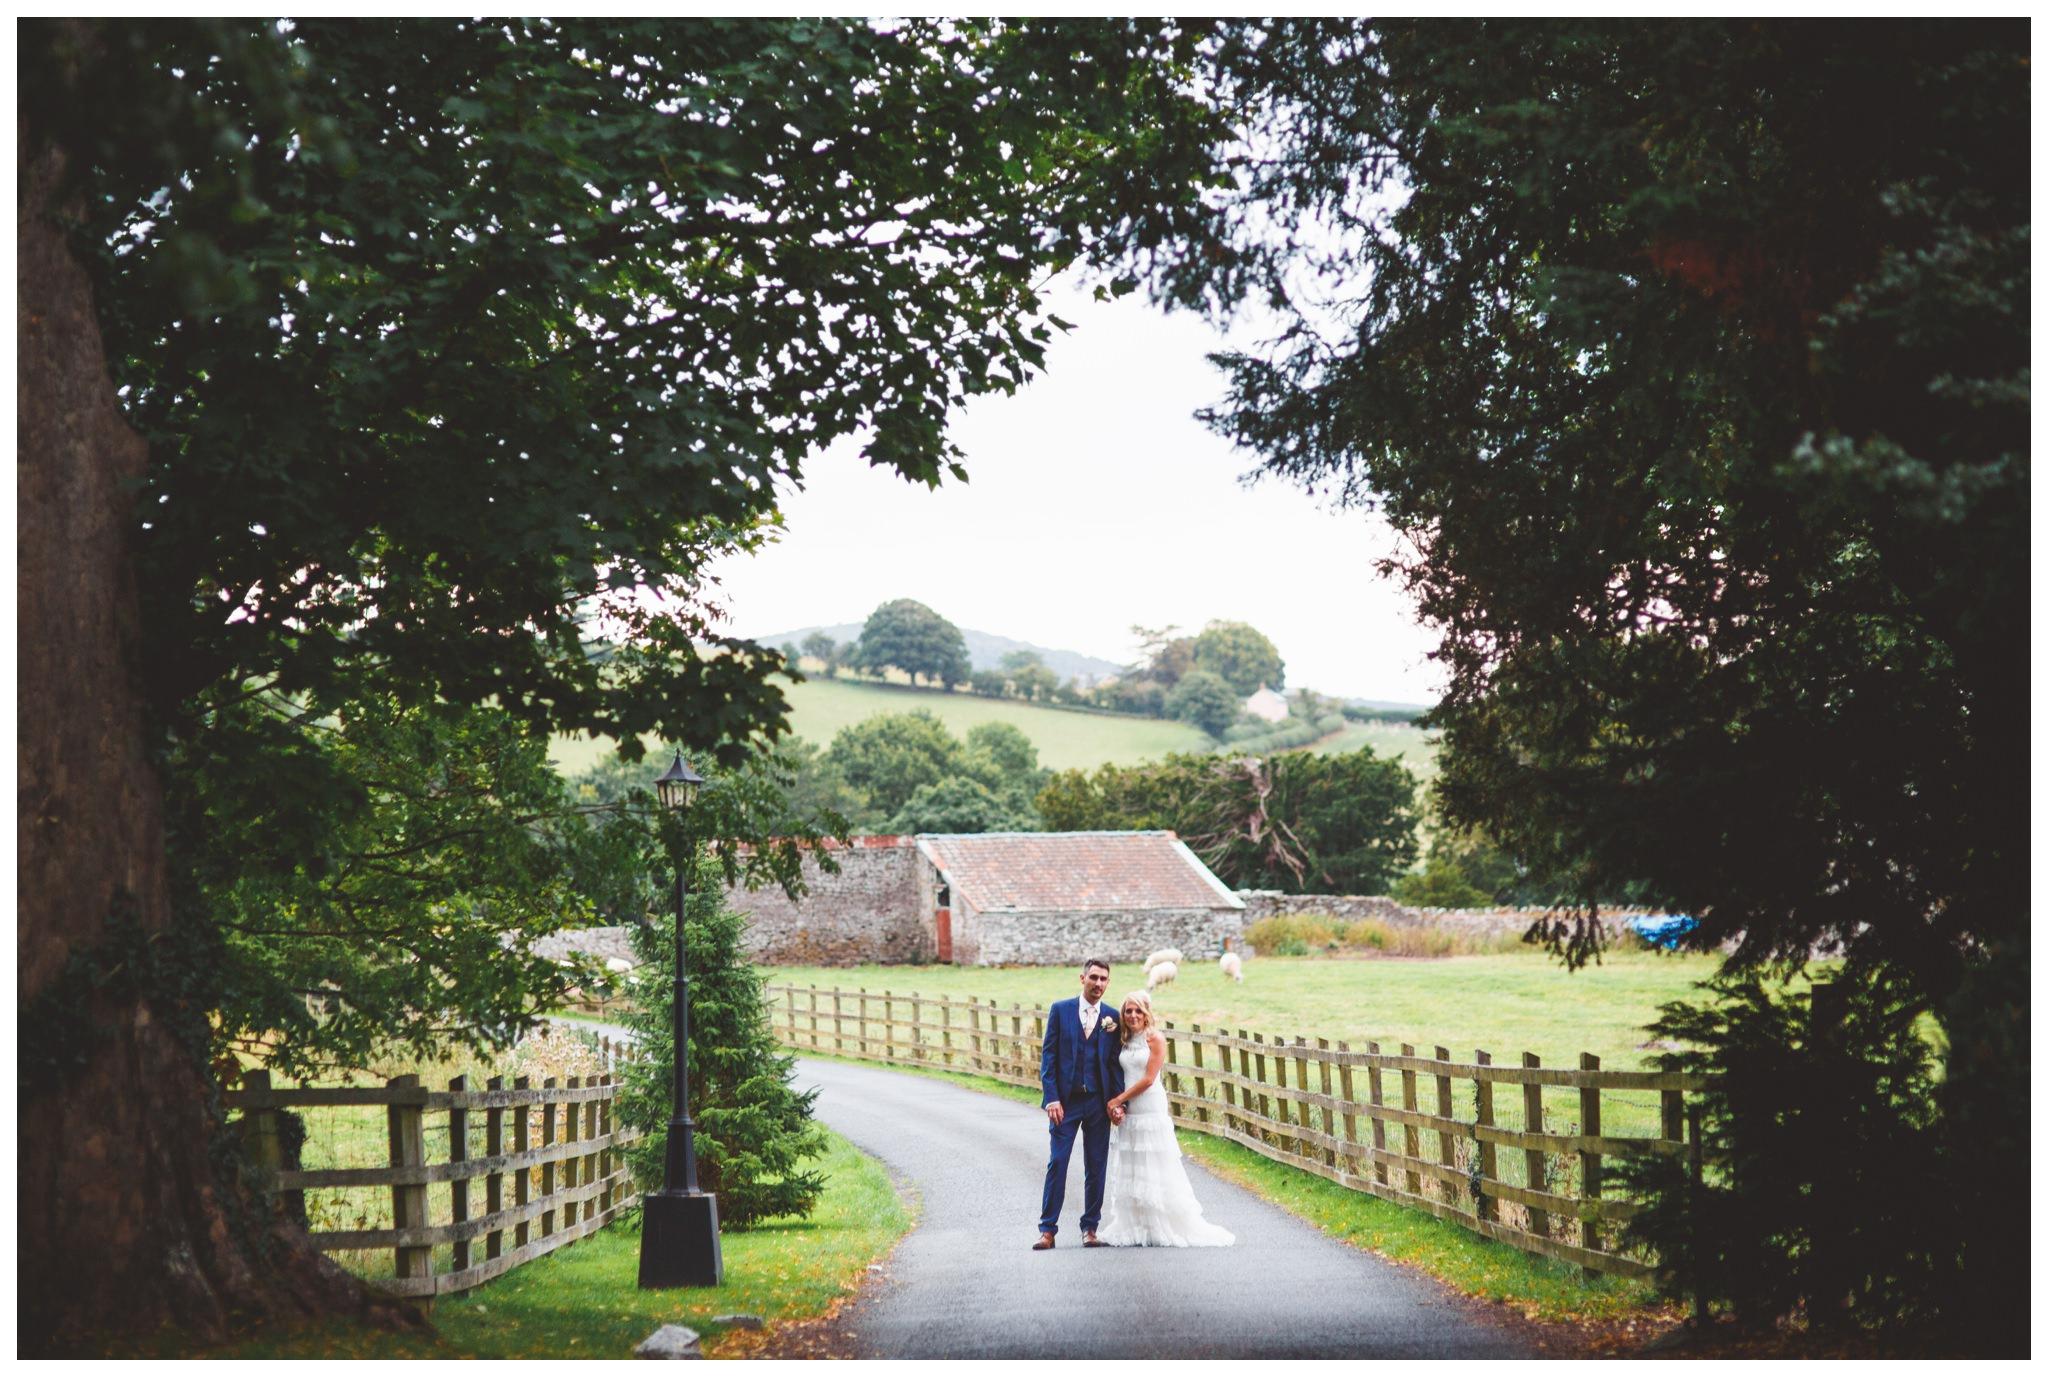 Richard Savage Photography - Wedding - Peterstone Court Brecon - 2016-05-11_0060